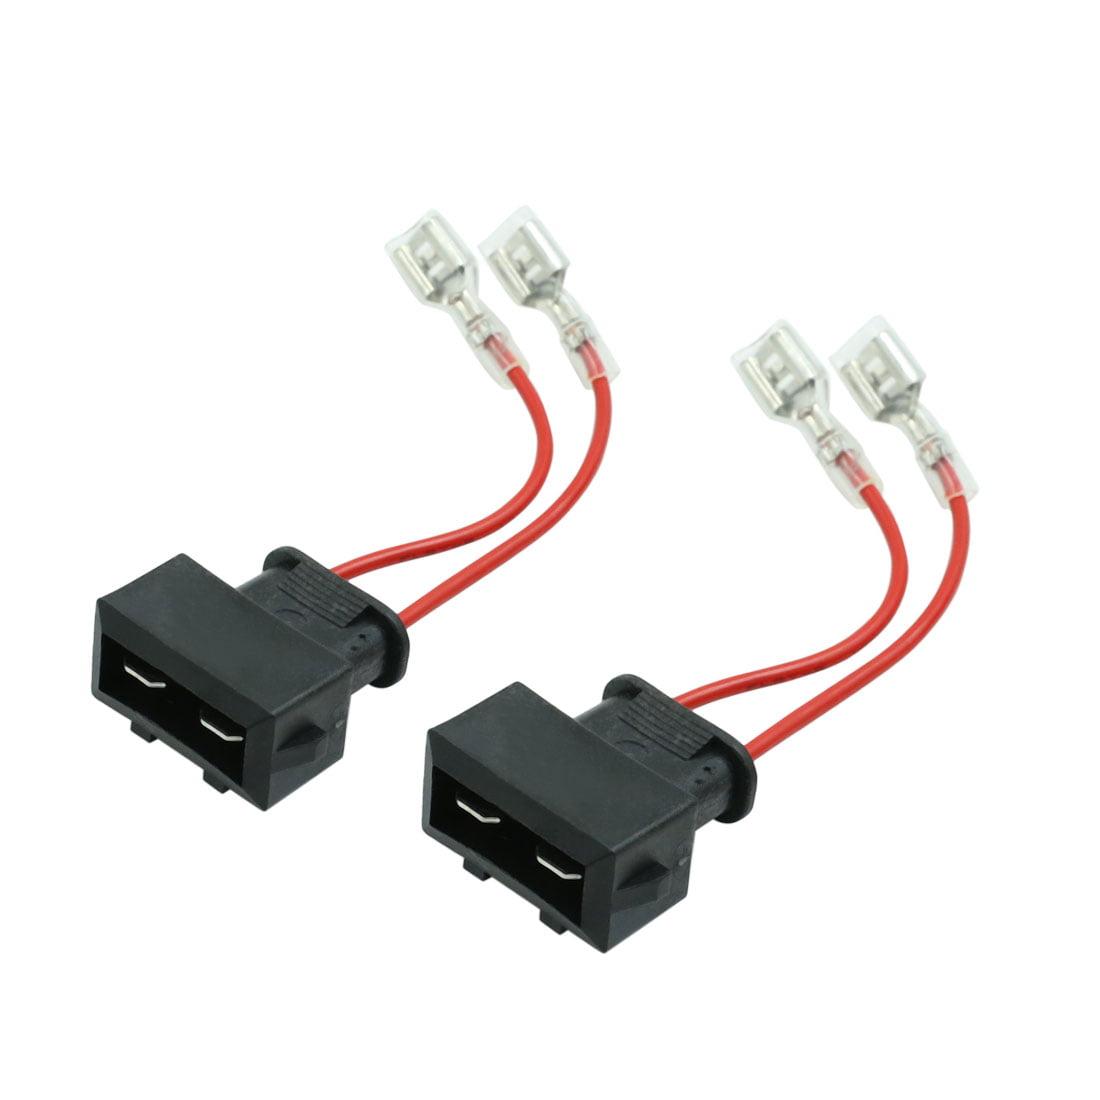 DC 12V Car Speaker Wire Harness Adapter Connector for Volkswagen Passat 2pcs - image 4 de 4